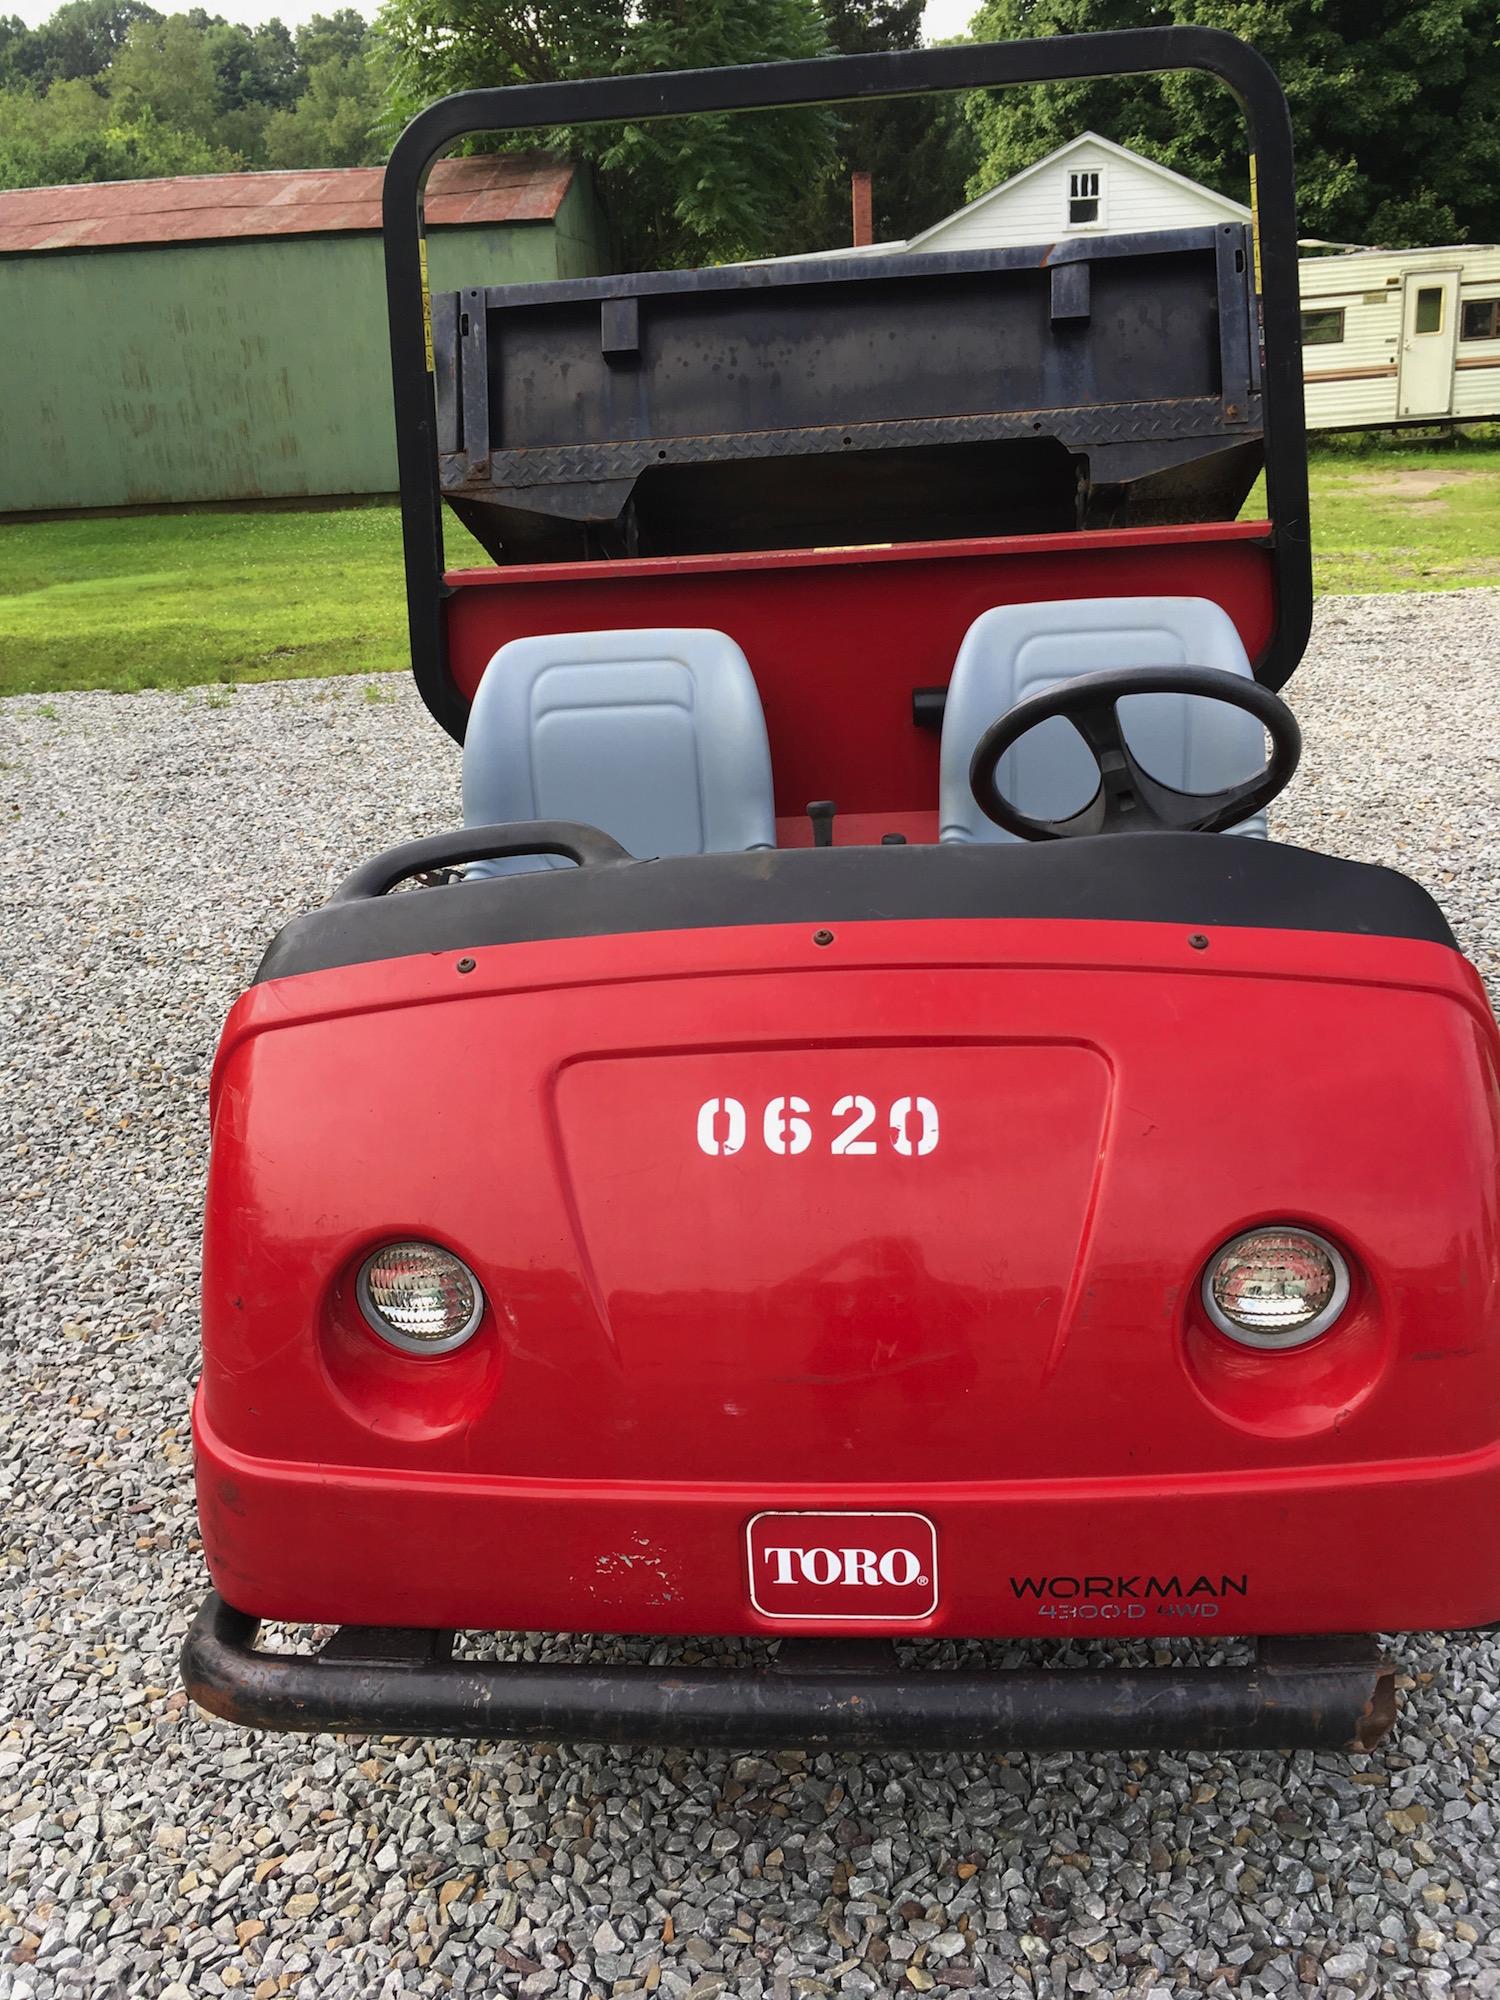 Toro-4300D-AWD-Workman-03